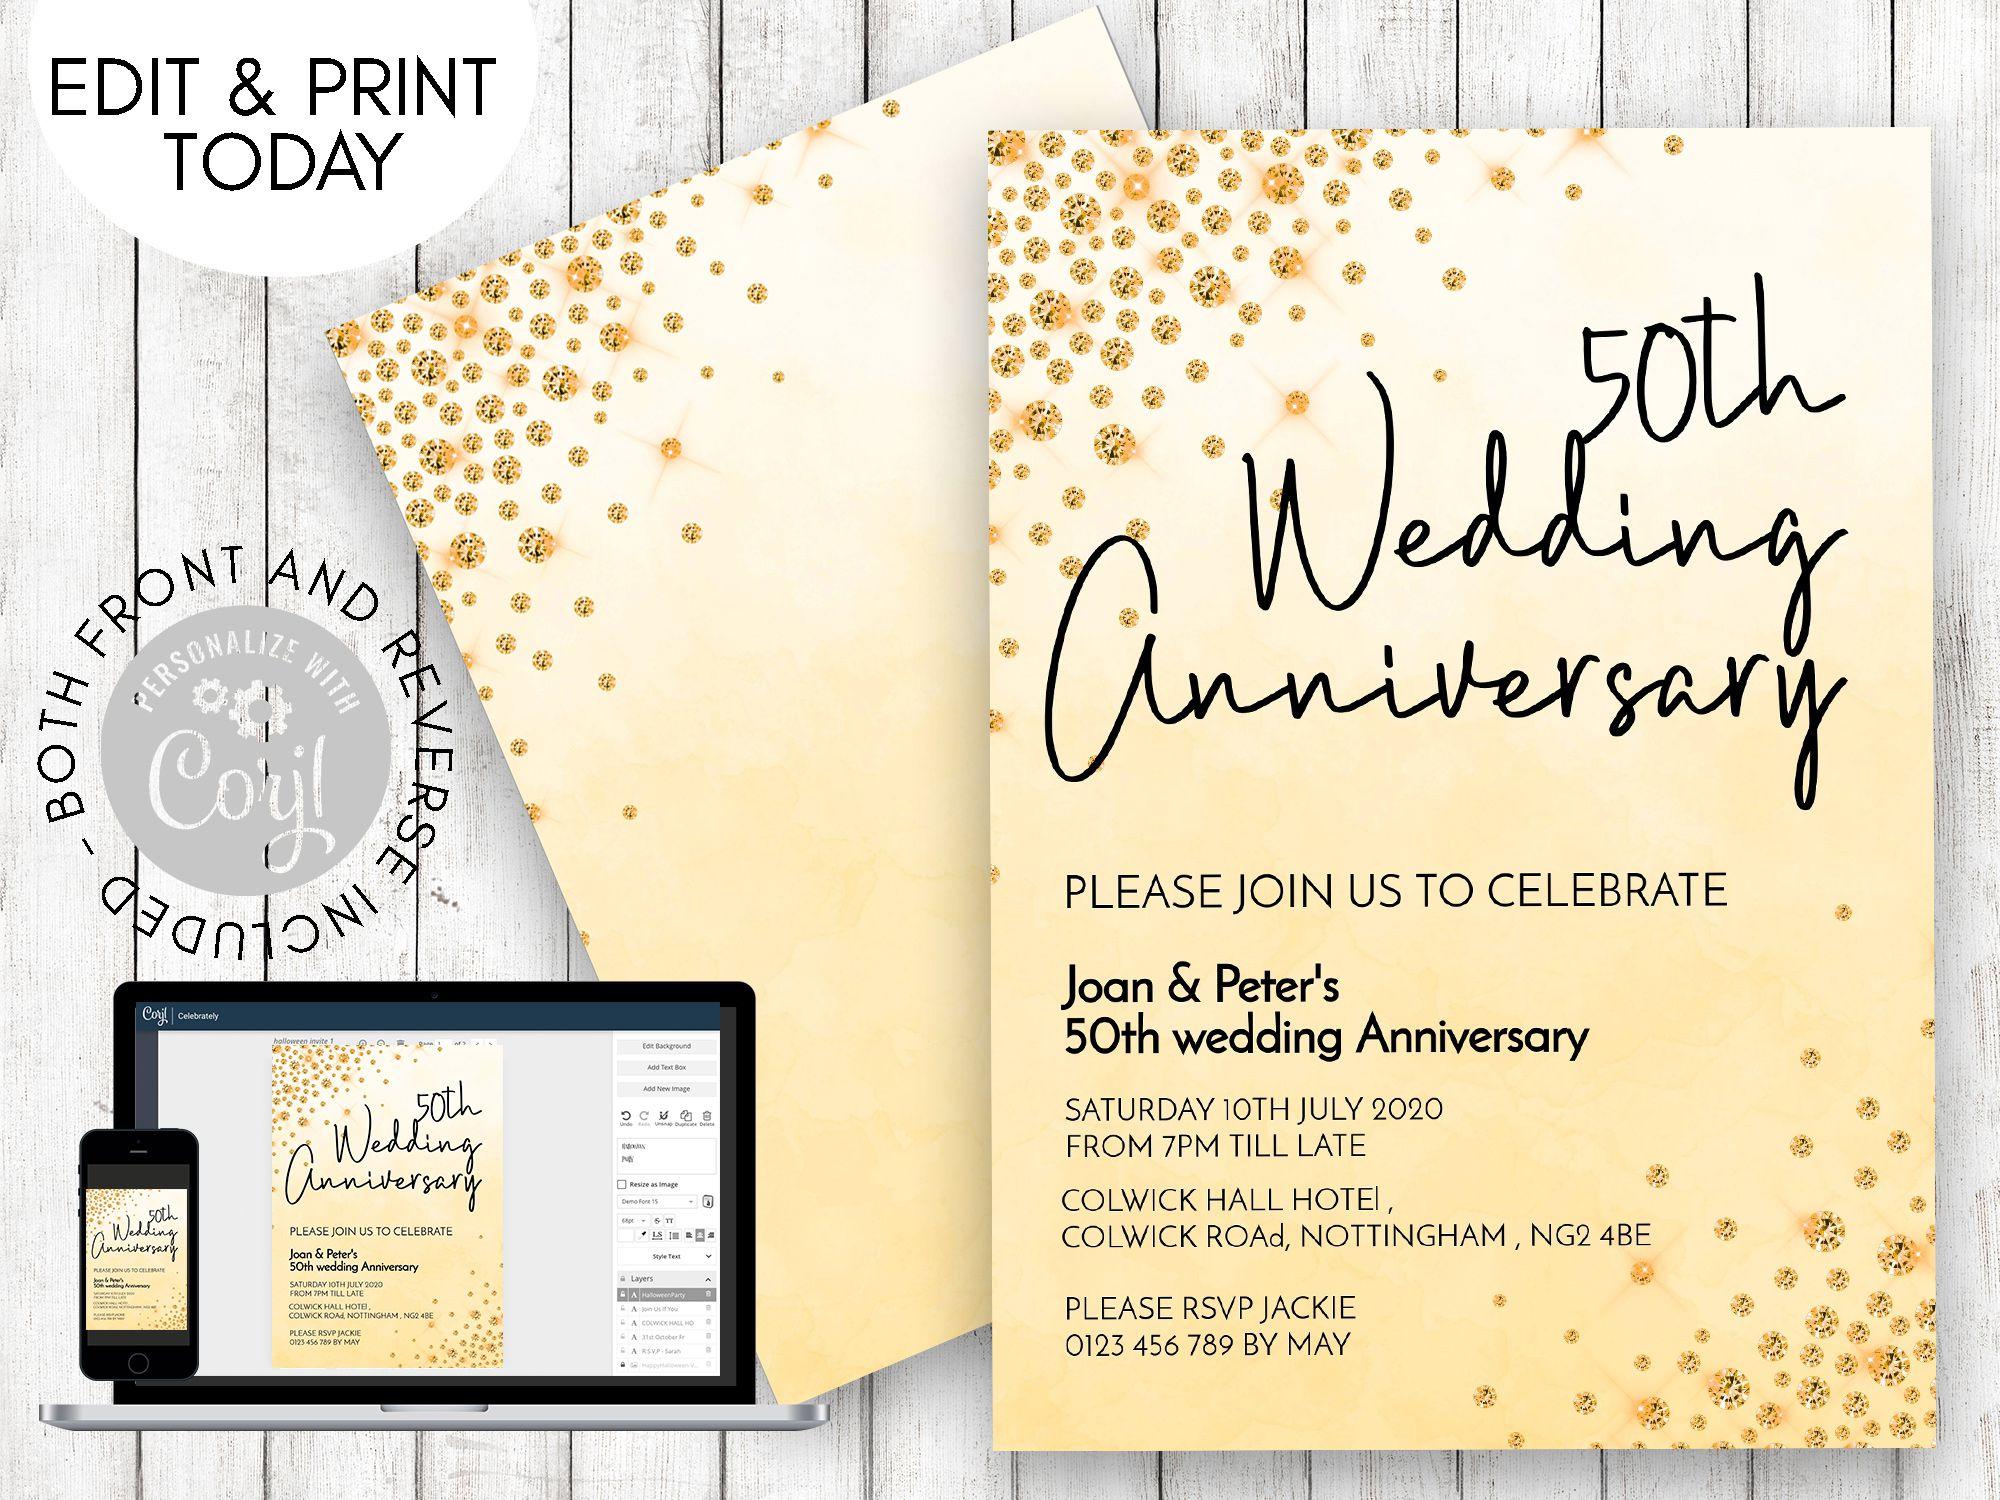 001 Unusual 50th Wedding Anniversary Invitation Template Free Highest Quality  Download Golden Microsoft WordFull